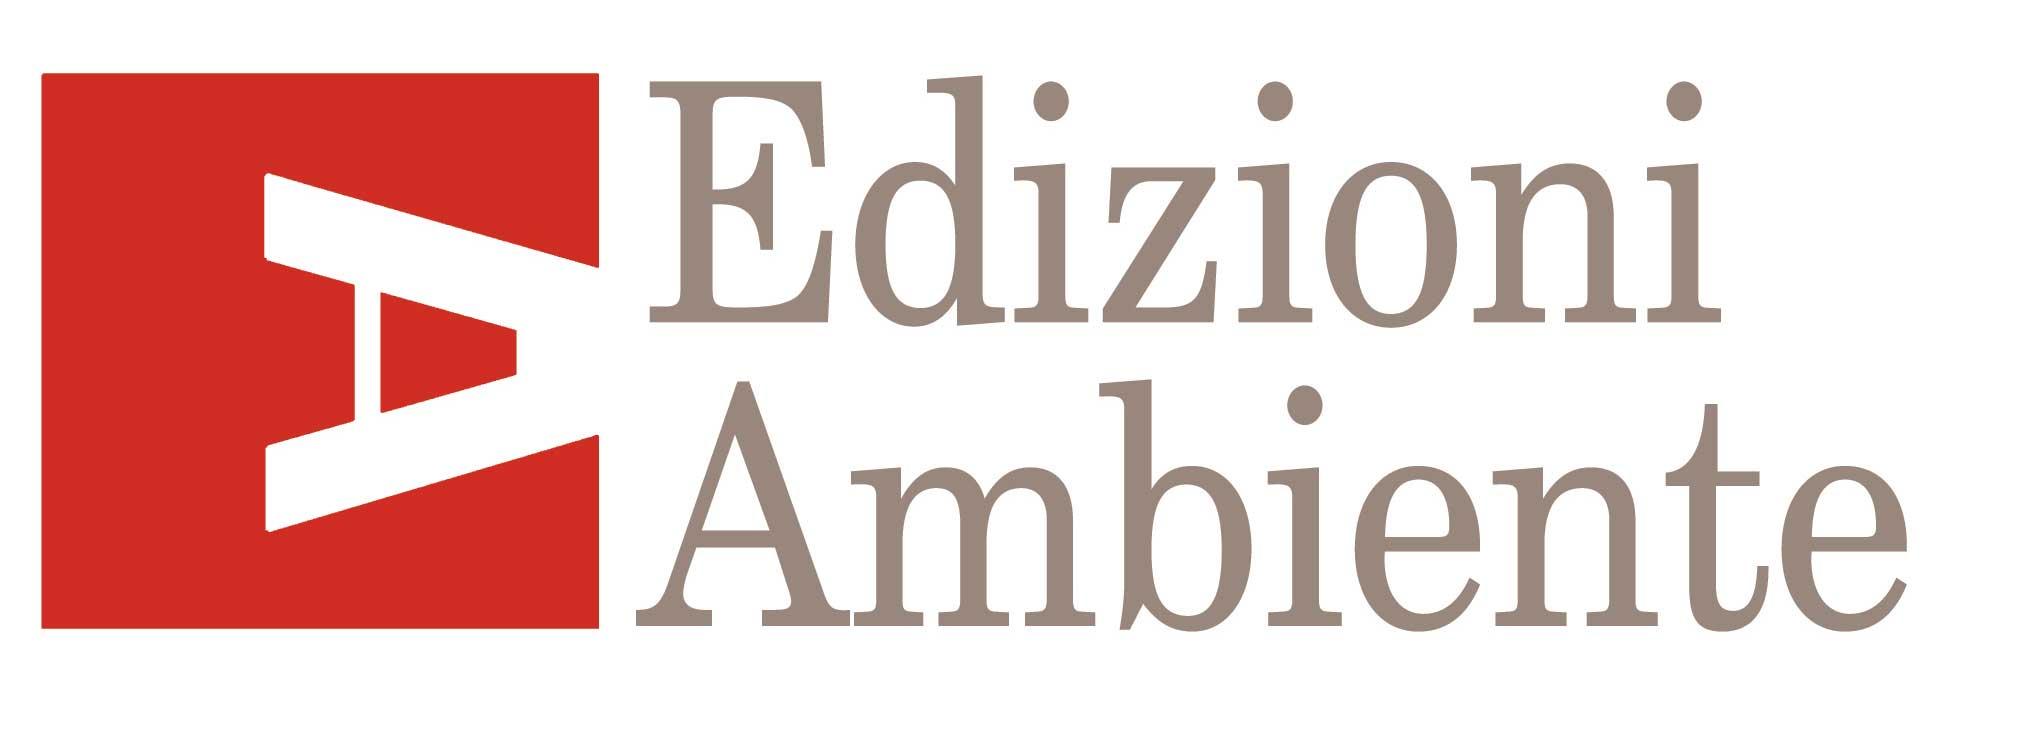 edizioni-ambiente-cut